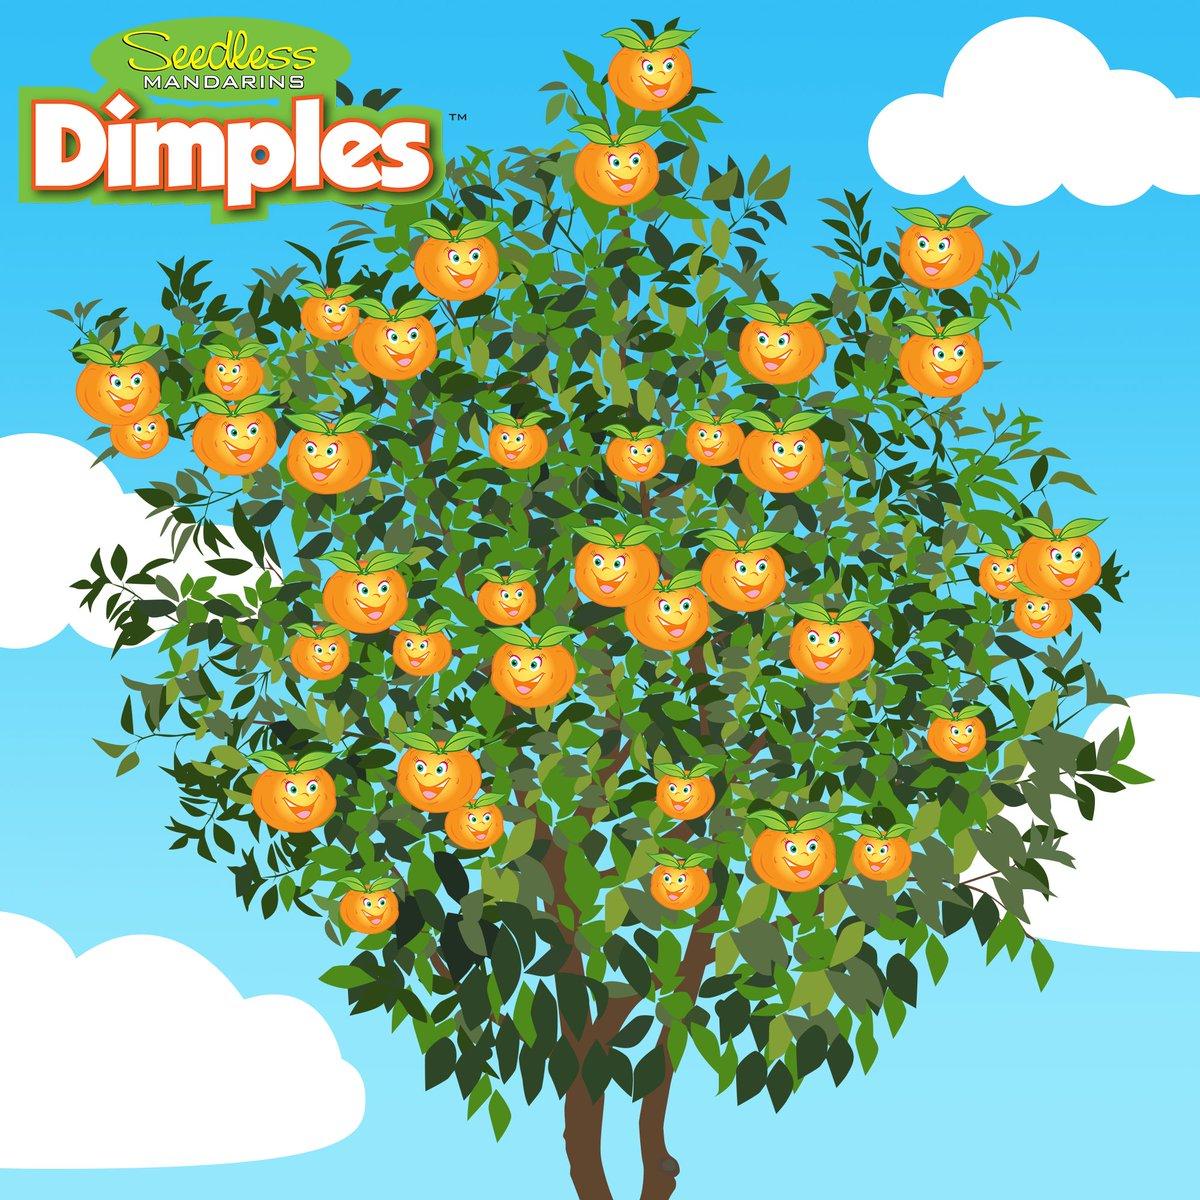 It's DIMPLES season!  #dimples #mandarins #mandarinoranges #sweet #season #goldnuggets #tasty #orange #fresh #fruit